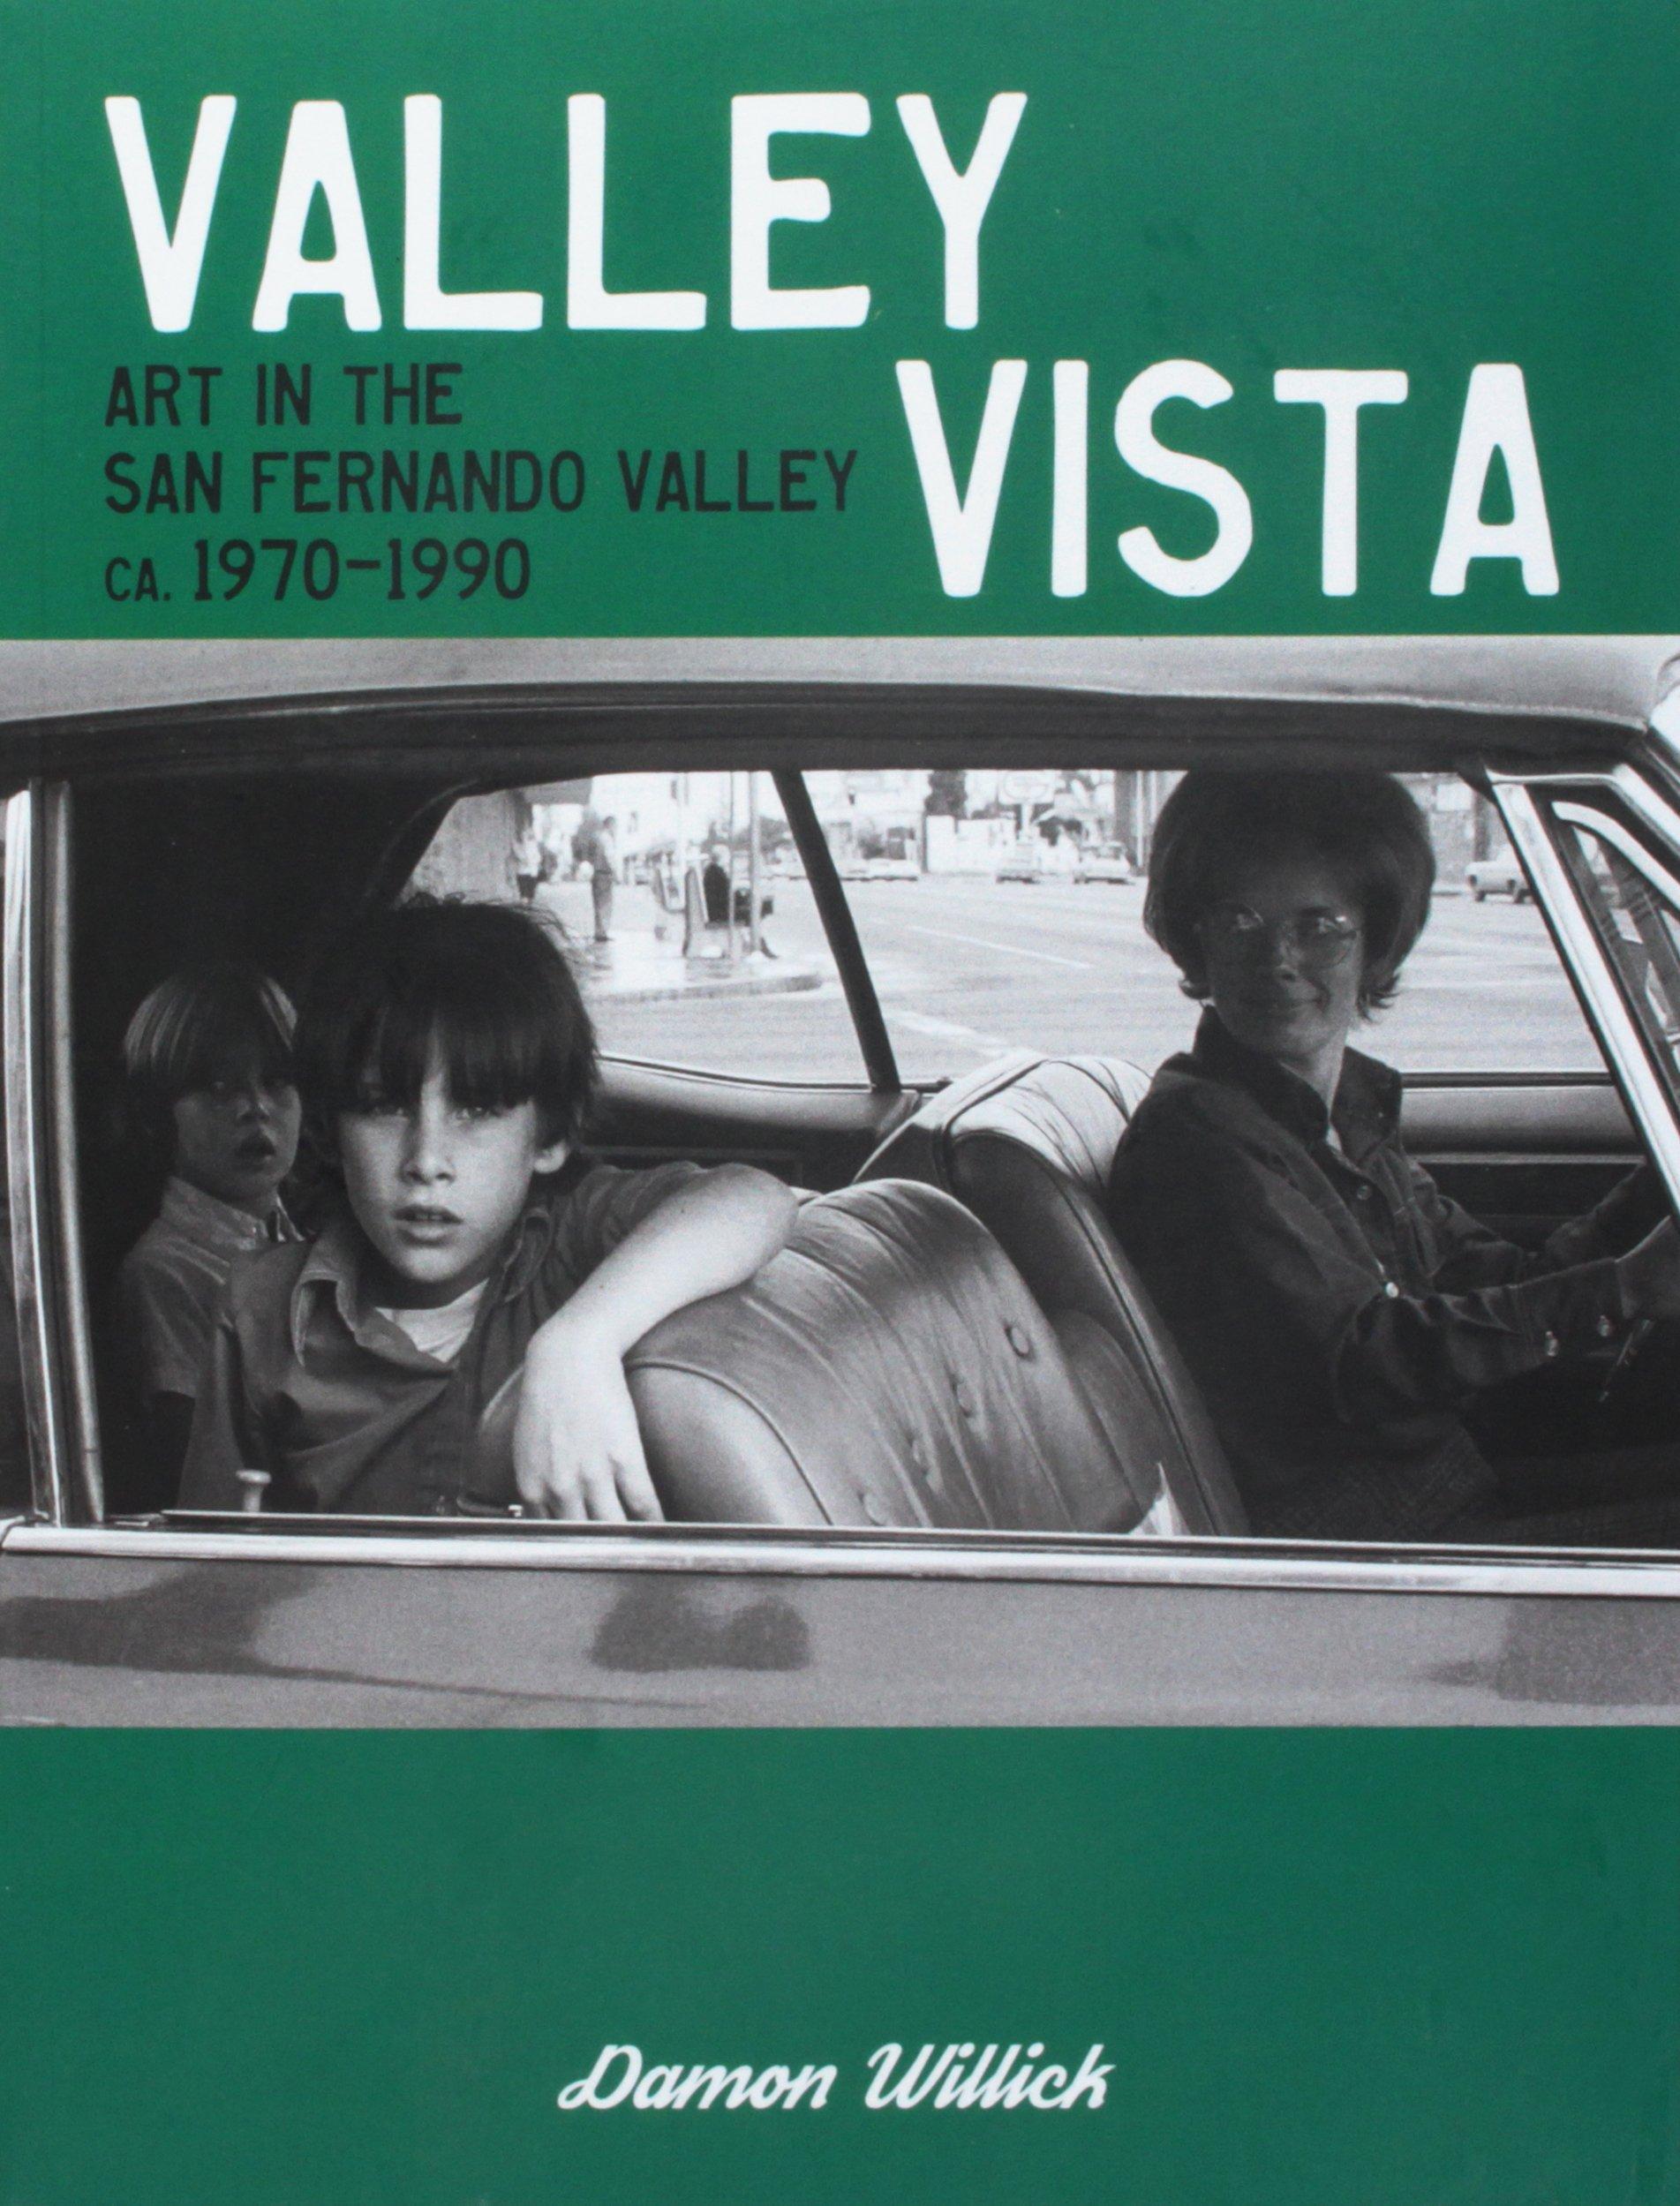 Valley Vista: Art in the San Fernando Valley, CA, 1970-1990 by Damon Willick PDF